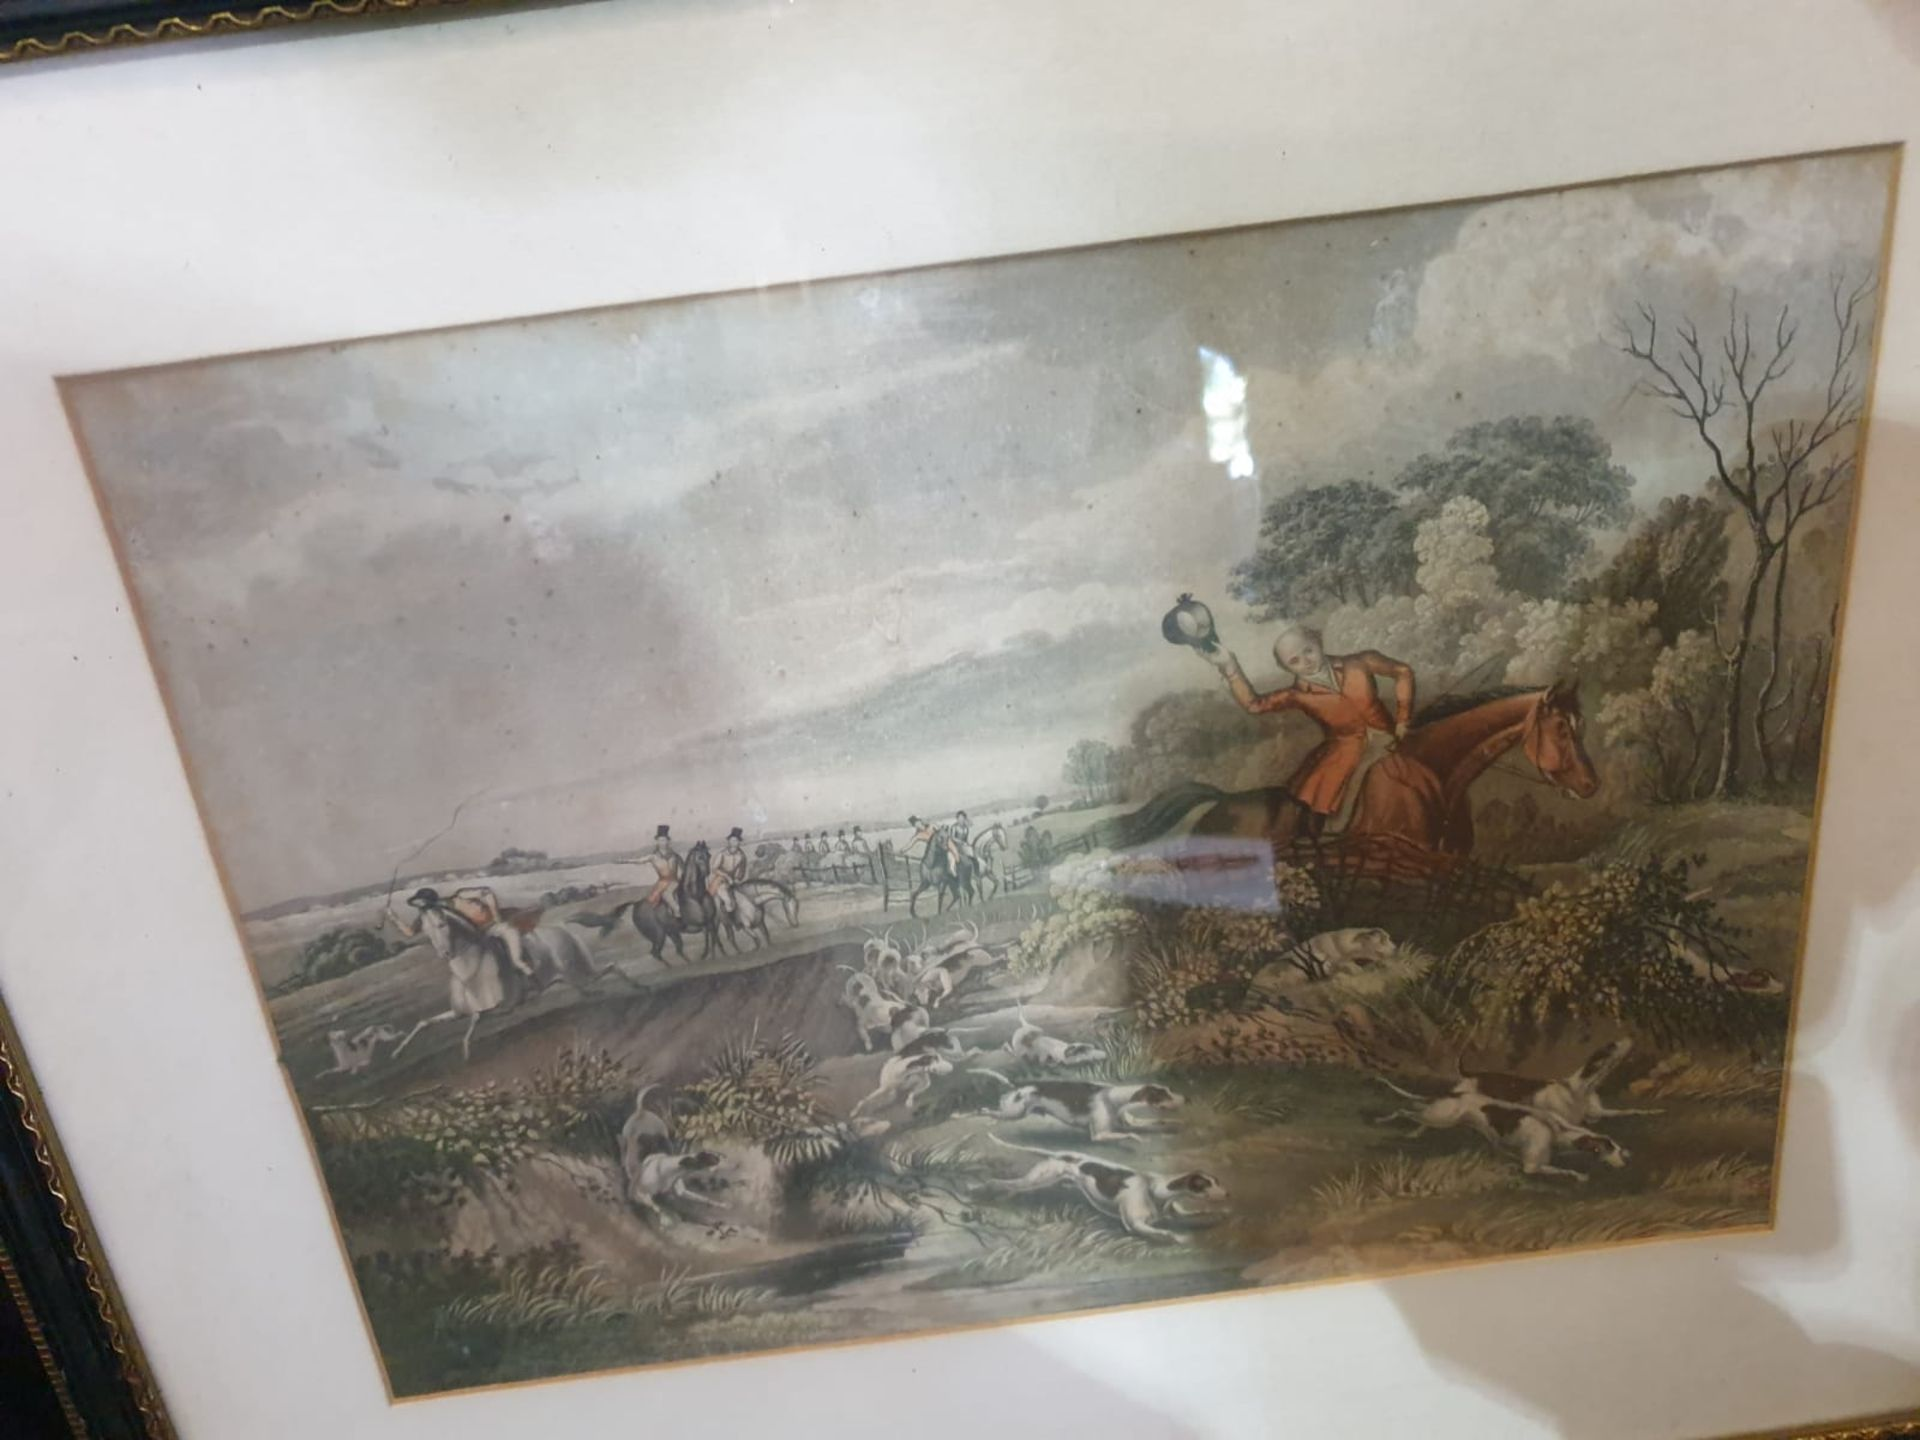 Set of 4 hunting aquatint prints in Black frame-50 x 42cm - Image 5 of 6